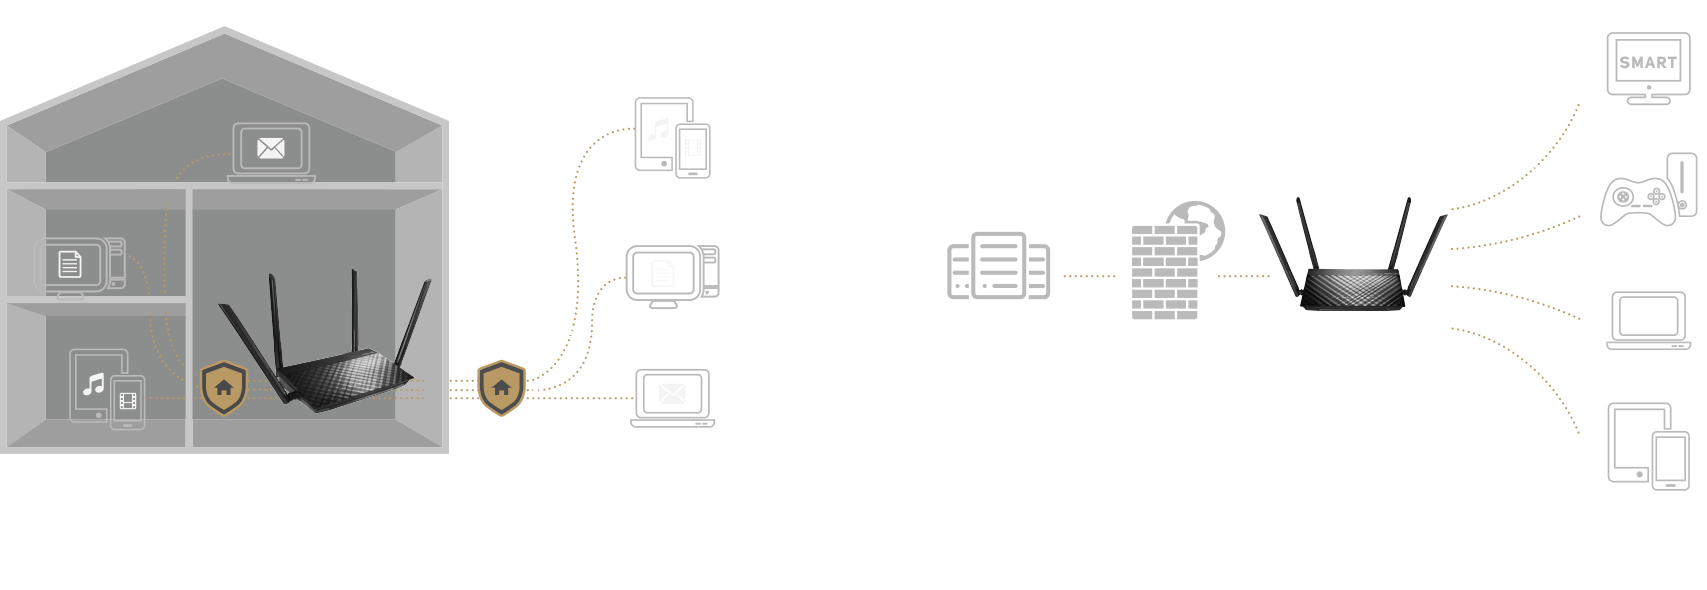 WiFi覆蓋範圍延伸器是搭配其他WiFi路由器一起使用的理想選擇